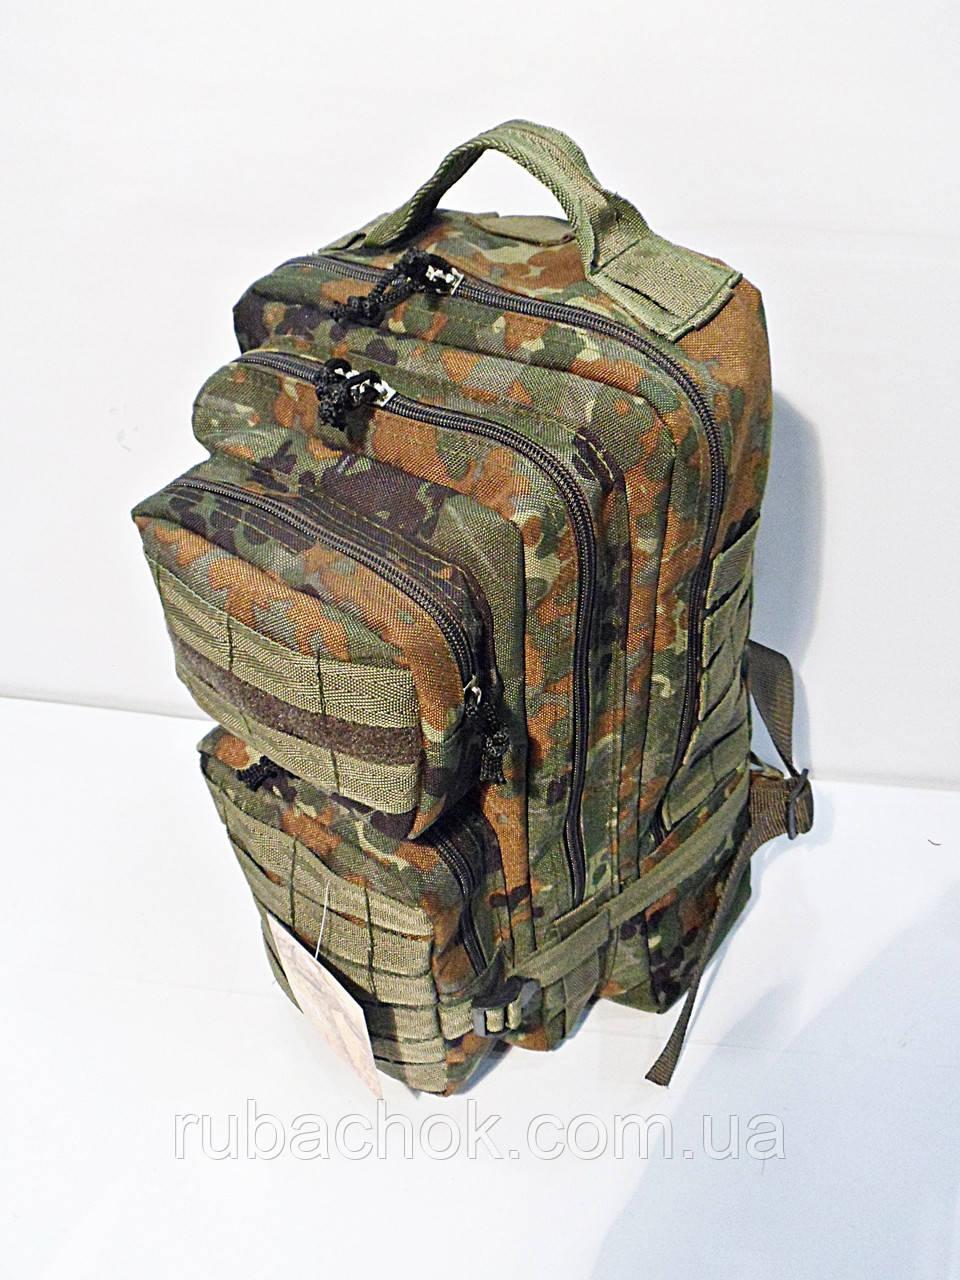 Тактичний, штурмовий рюкзак Флектарн